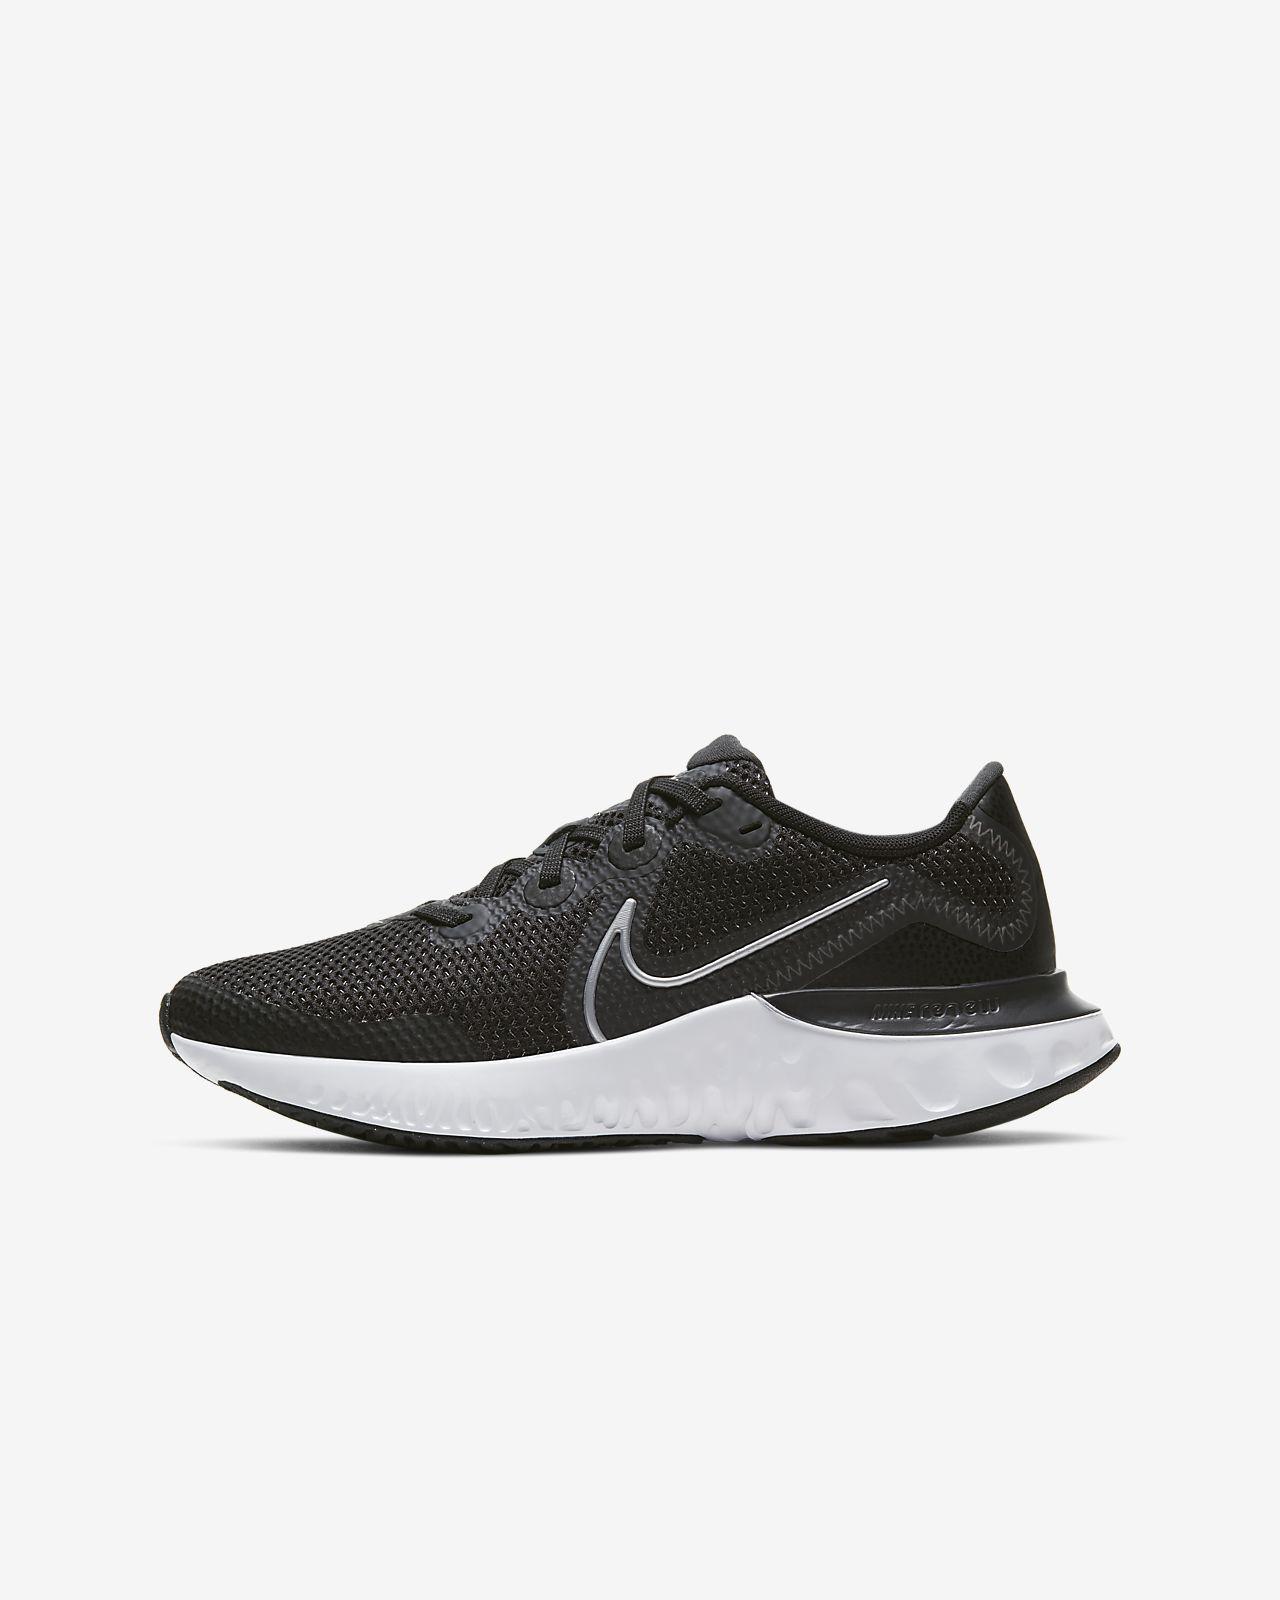 Löparsko Nike Renew Run för ungdom